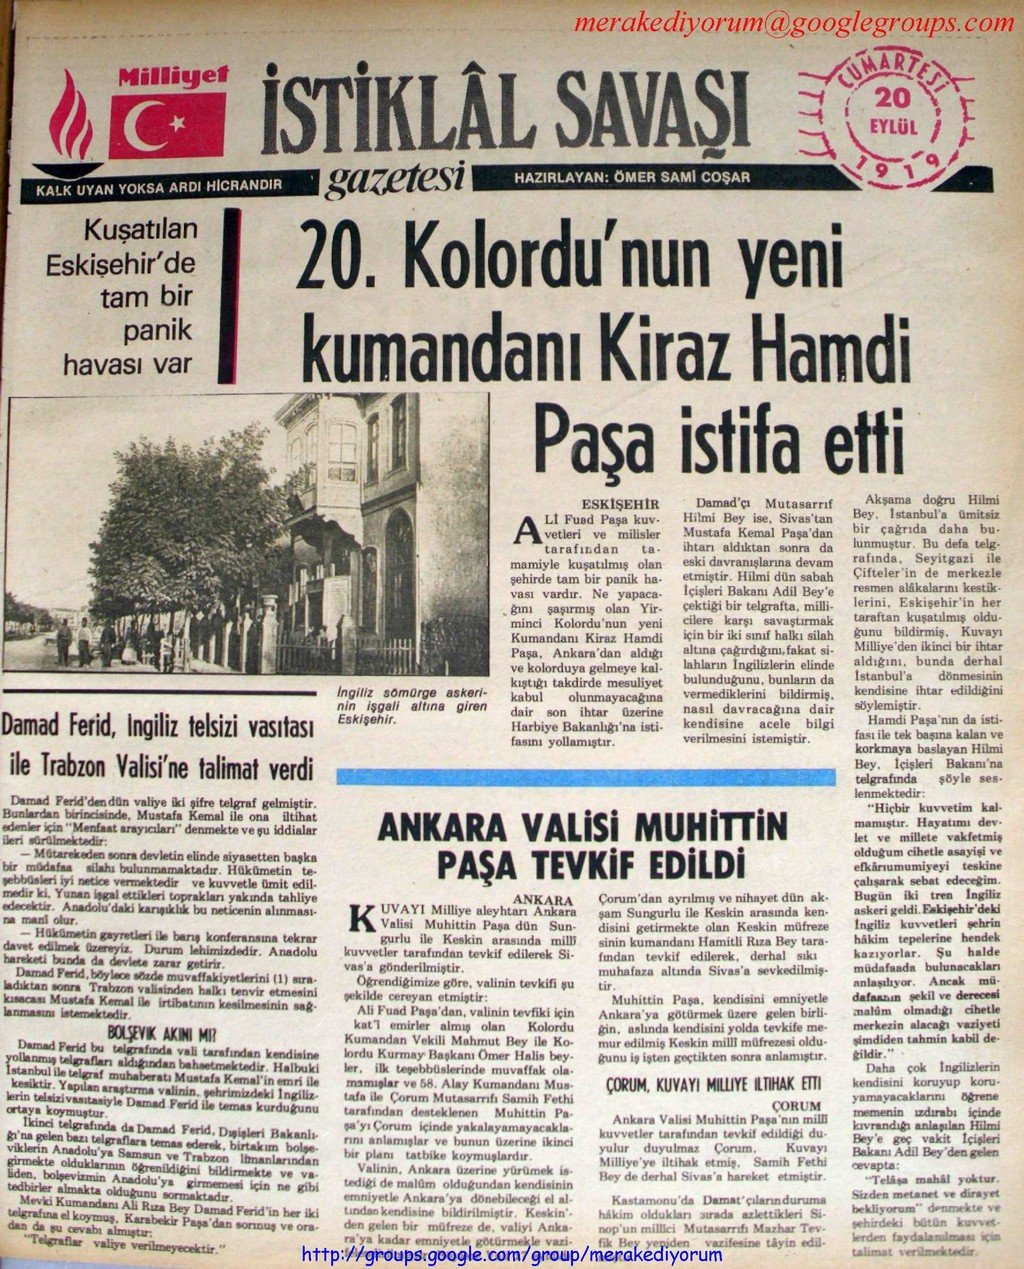 istiklal savaşı gazetesi - 20 eylül 1919